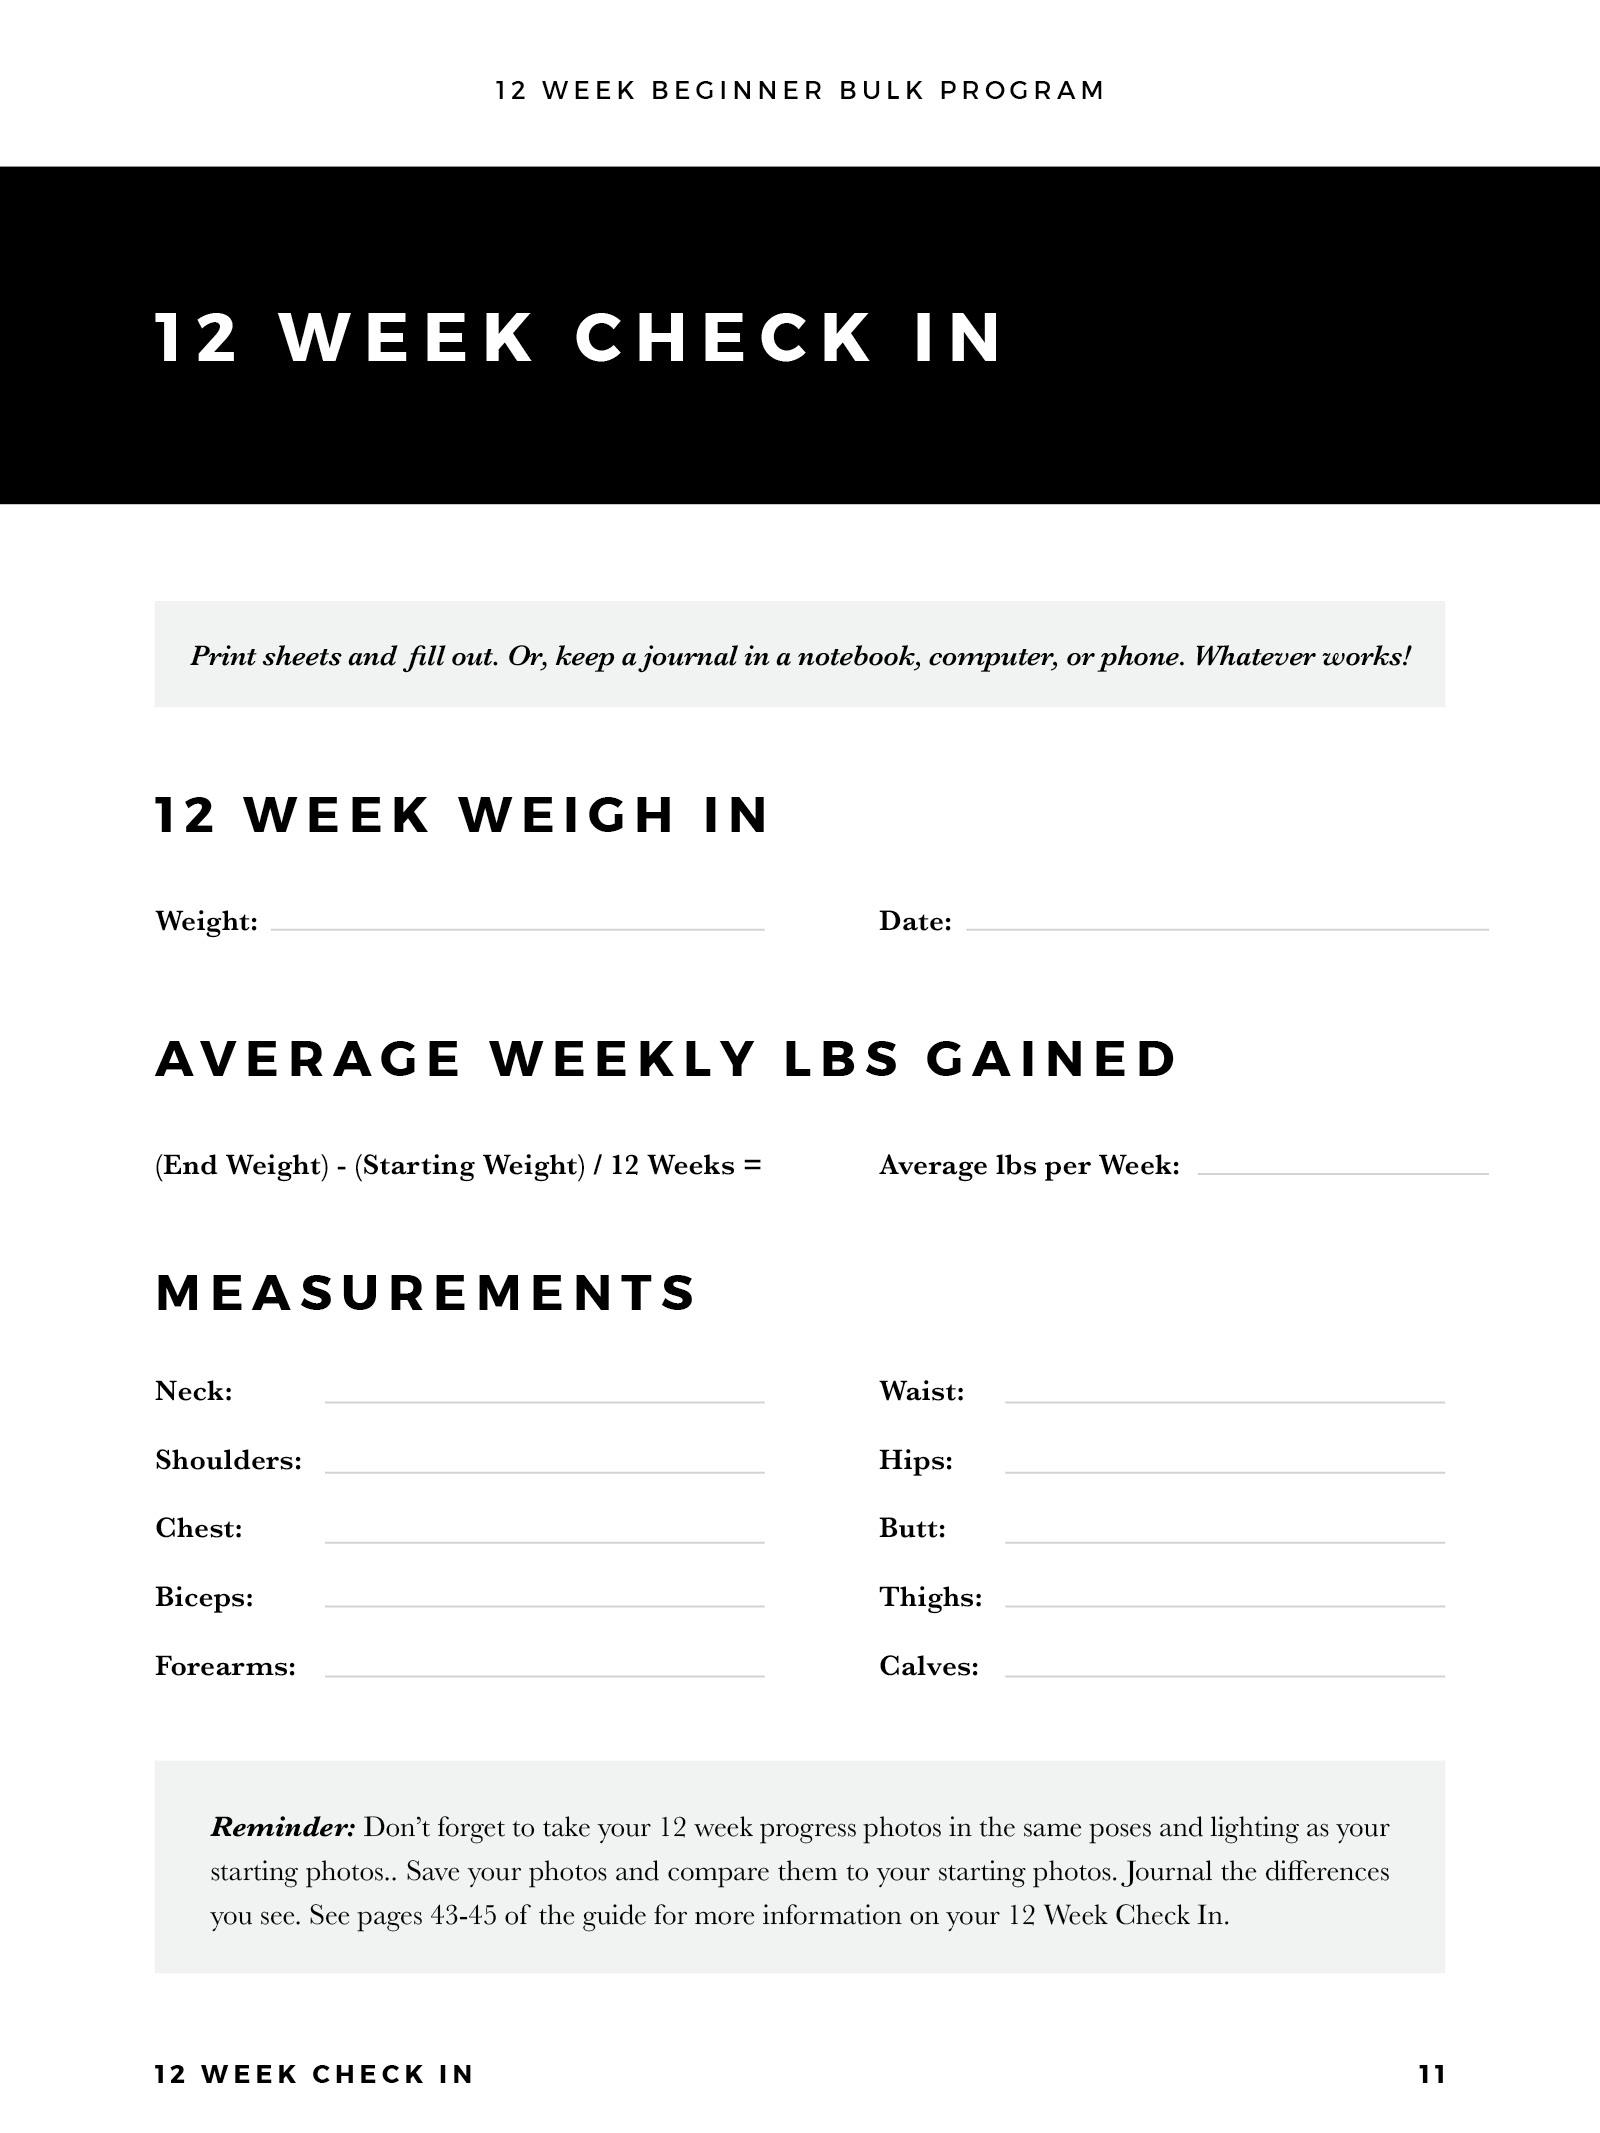 12WeekBeginnerBulkProgram_Charts11.jpg